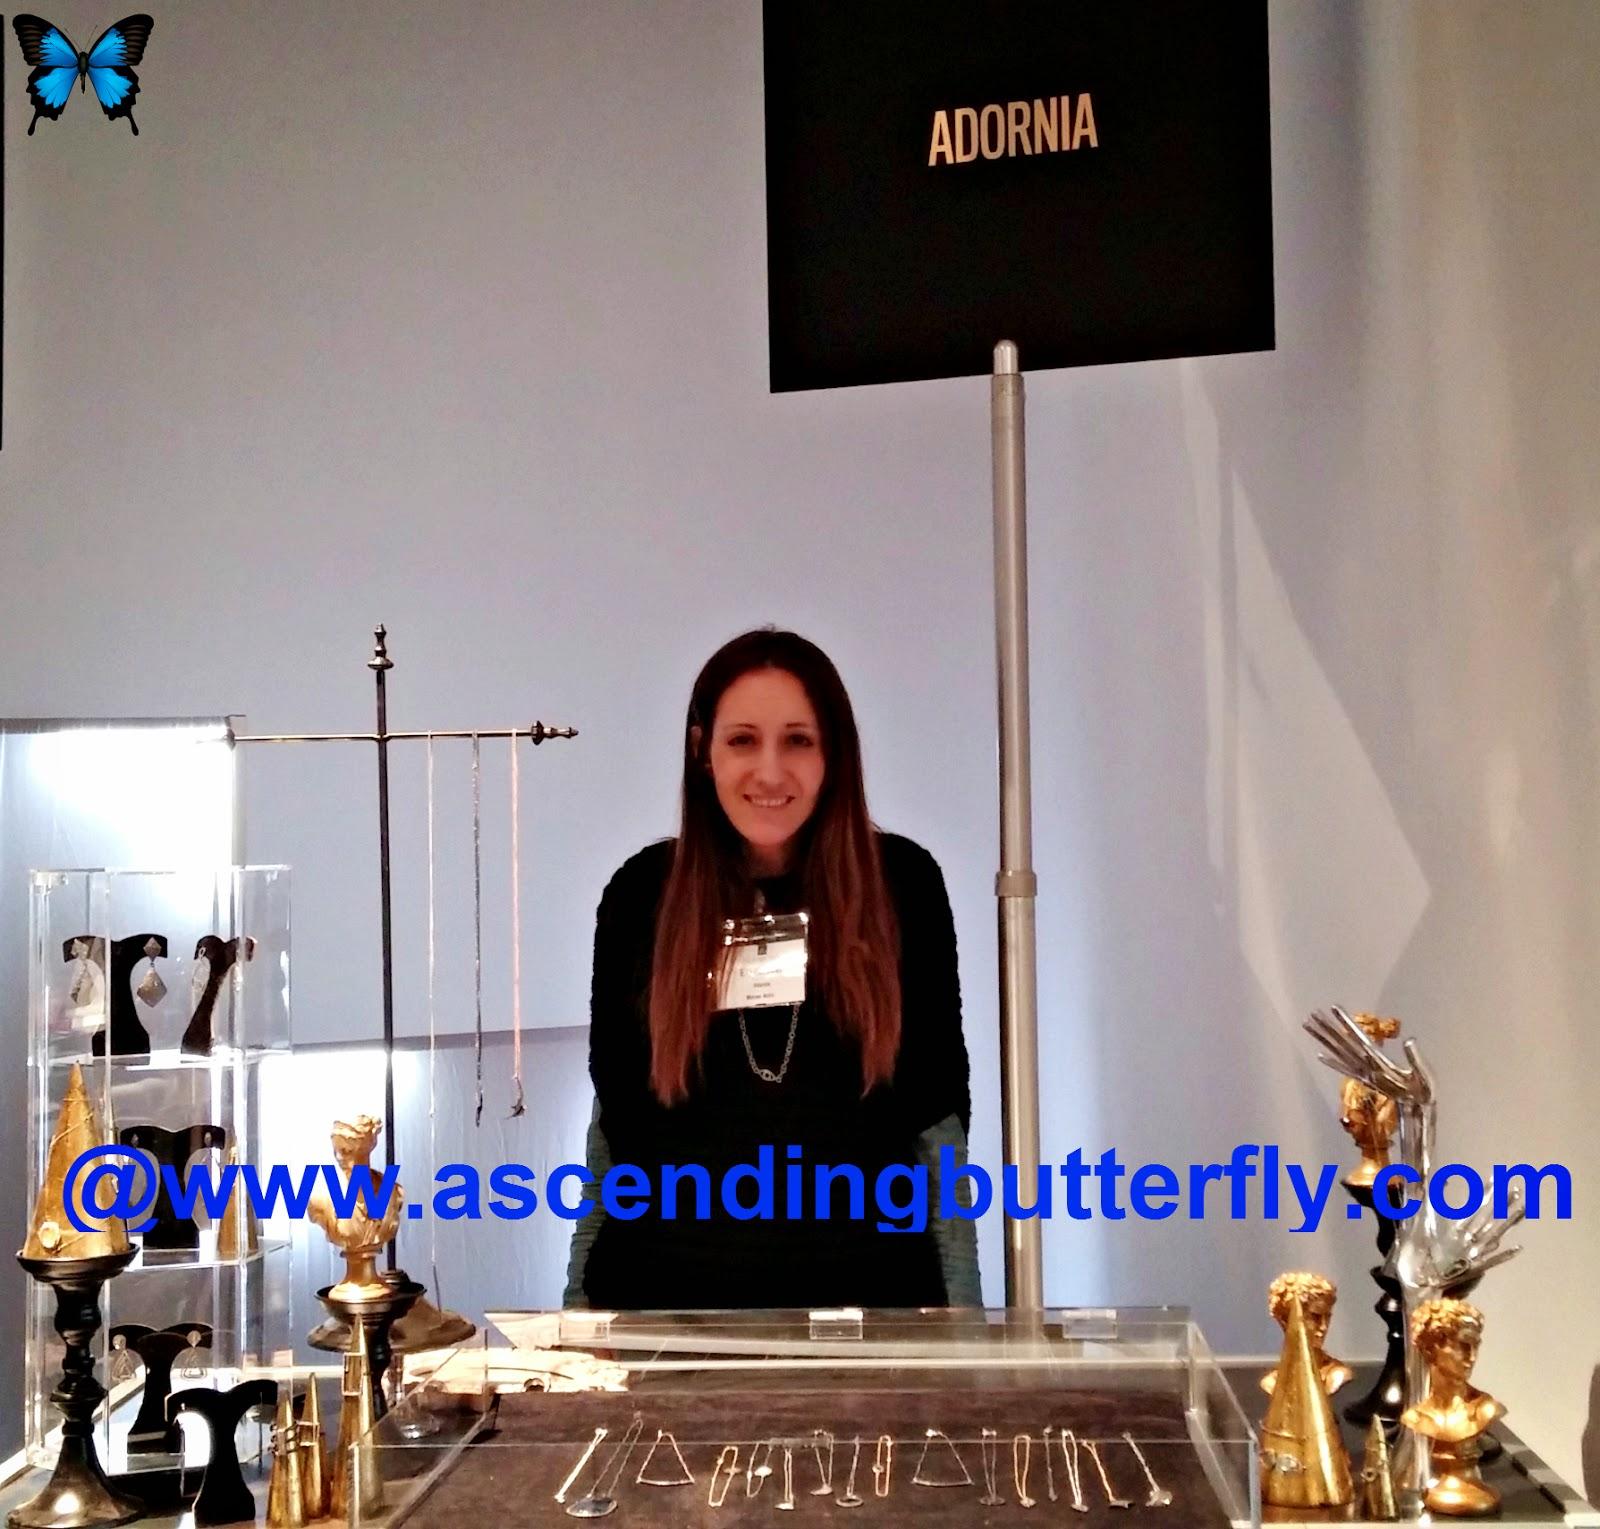 Adornia Jewelry